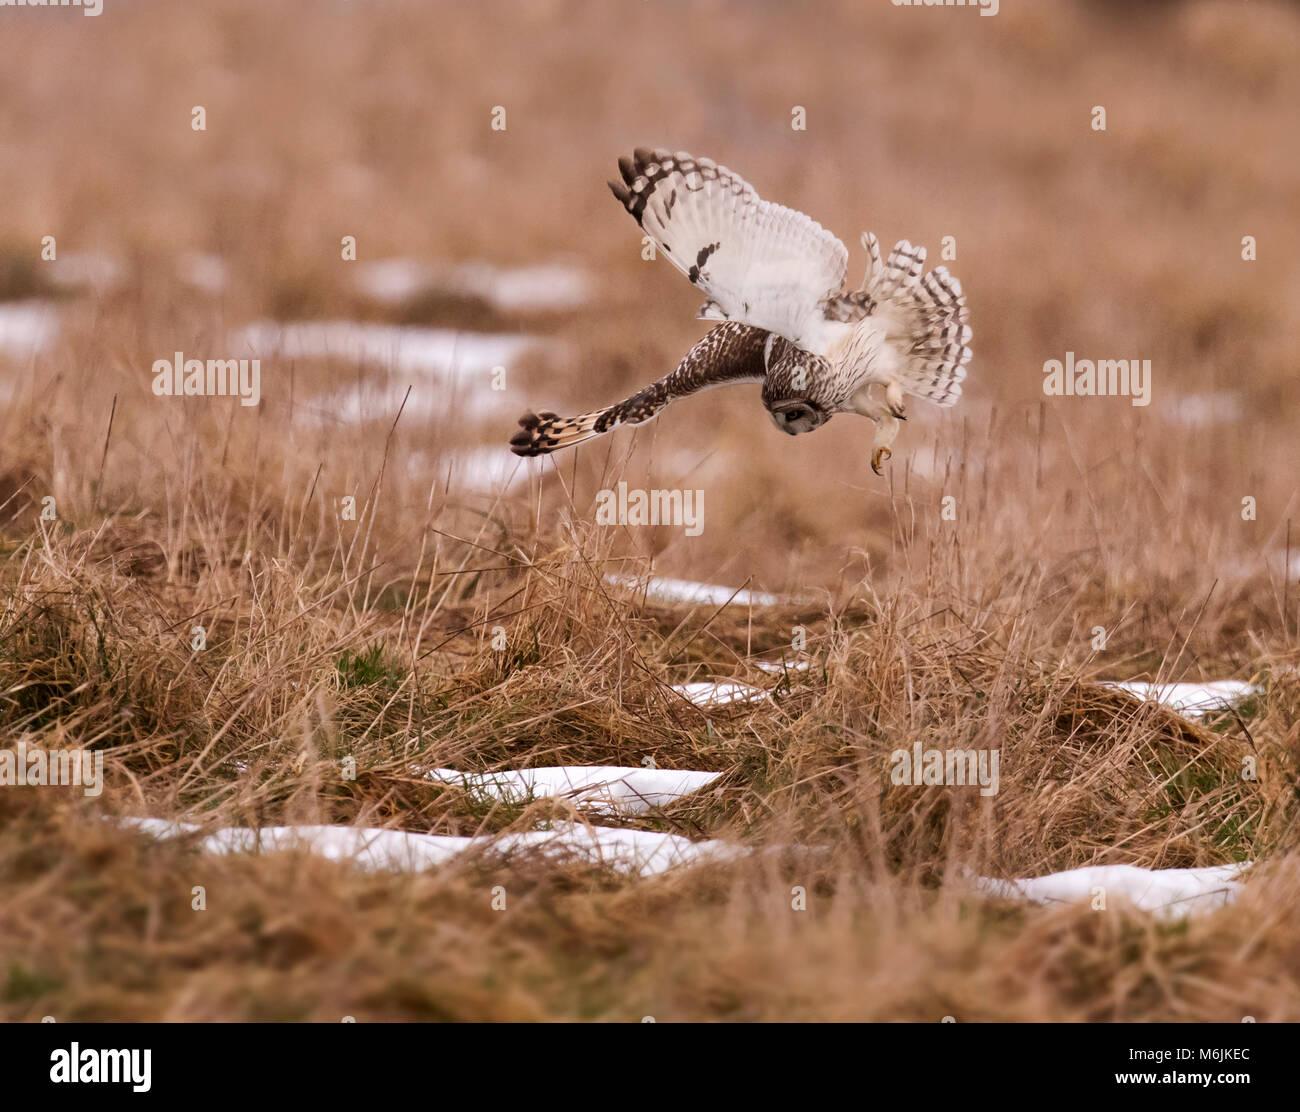 Wild Short Eared Owl (Asio Flammeus) Tauchen auf ahnungslose Beute in Gloucestershire Stockfoto